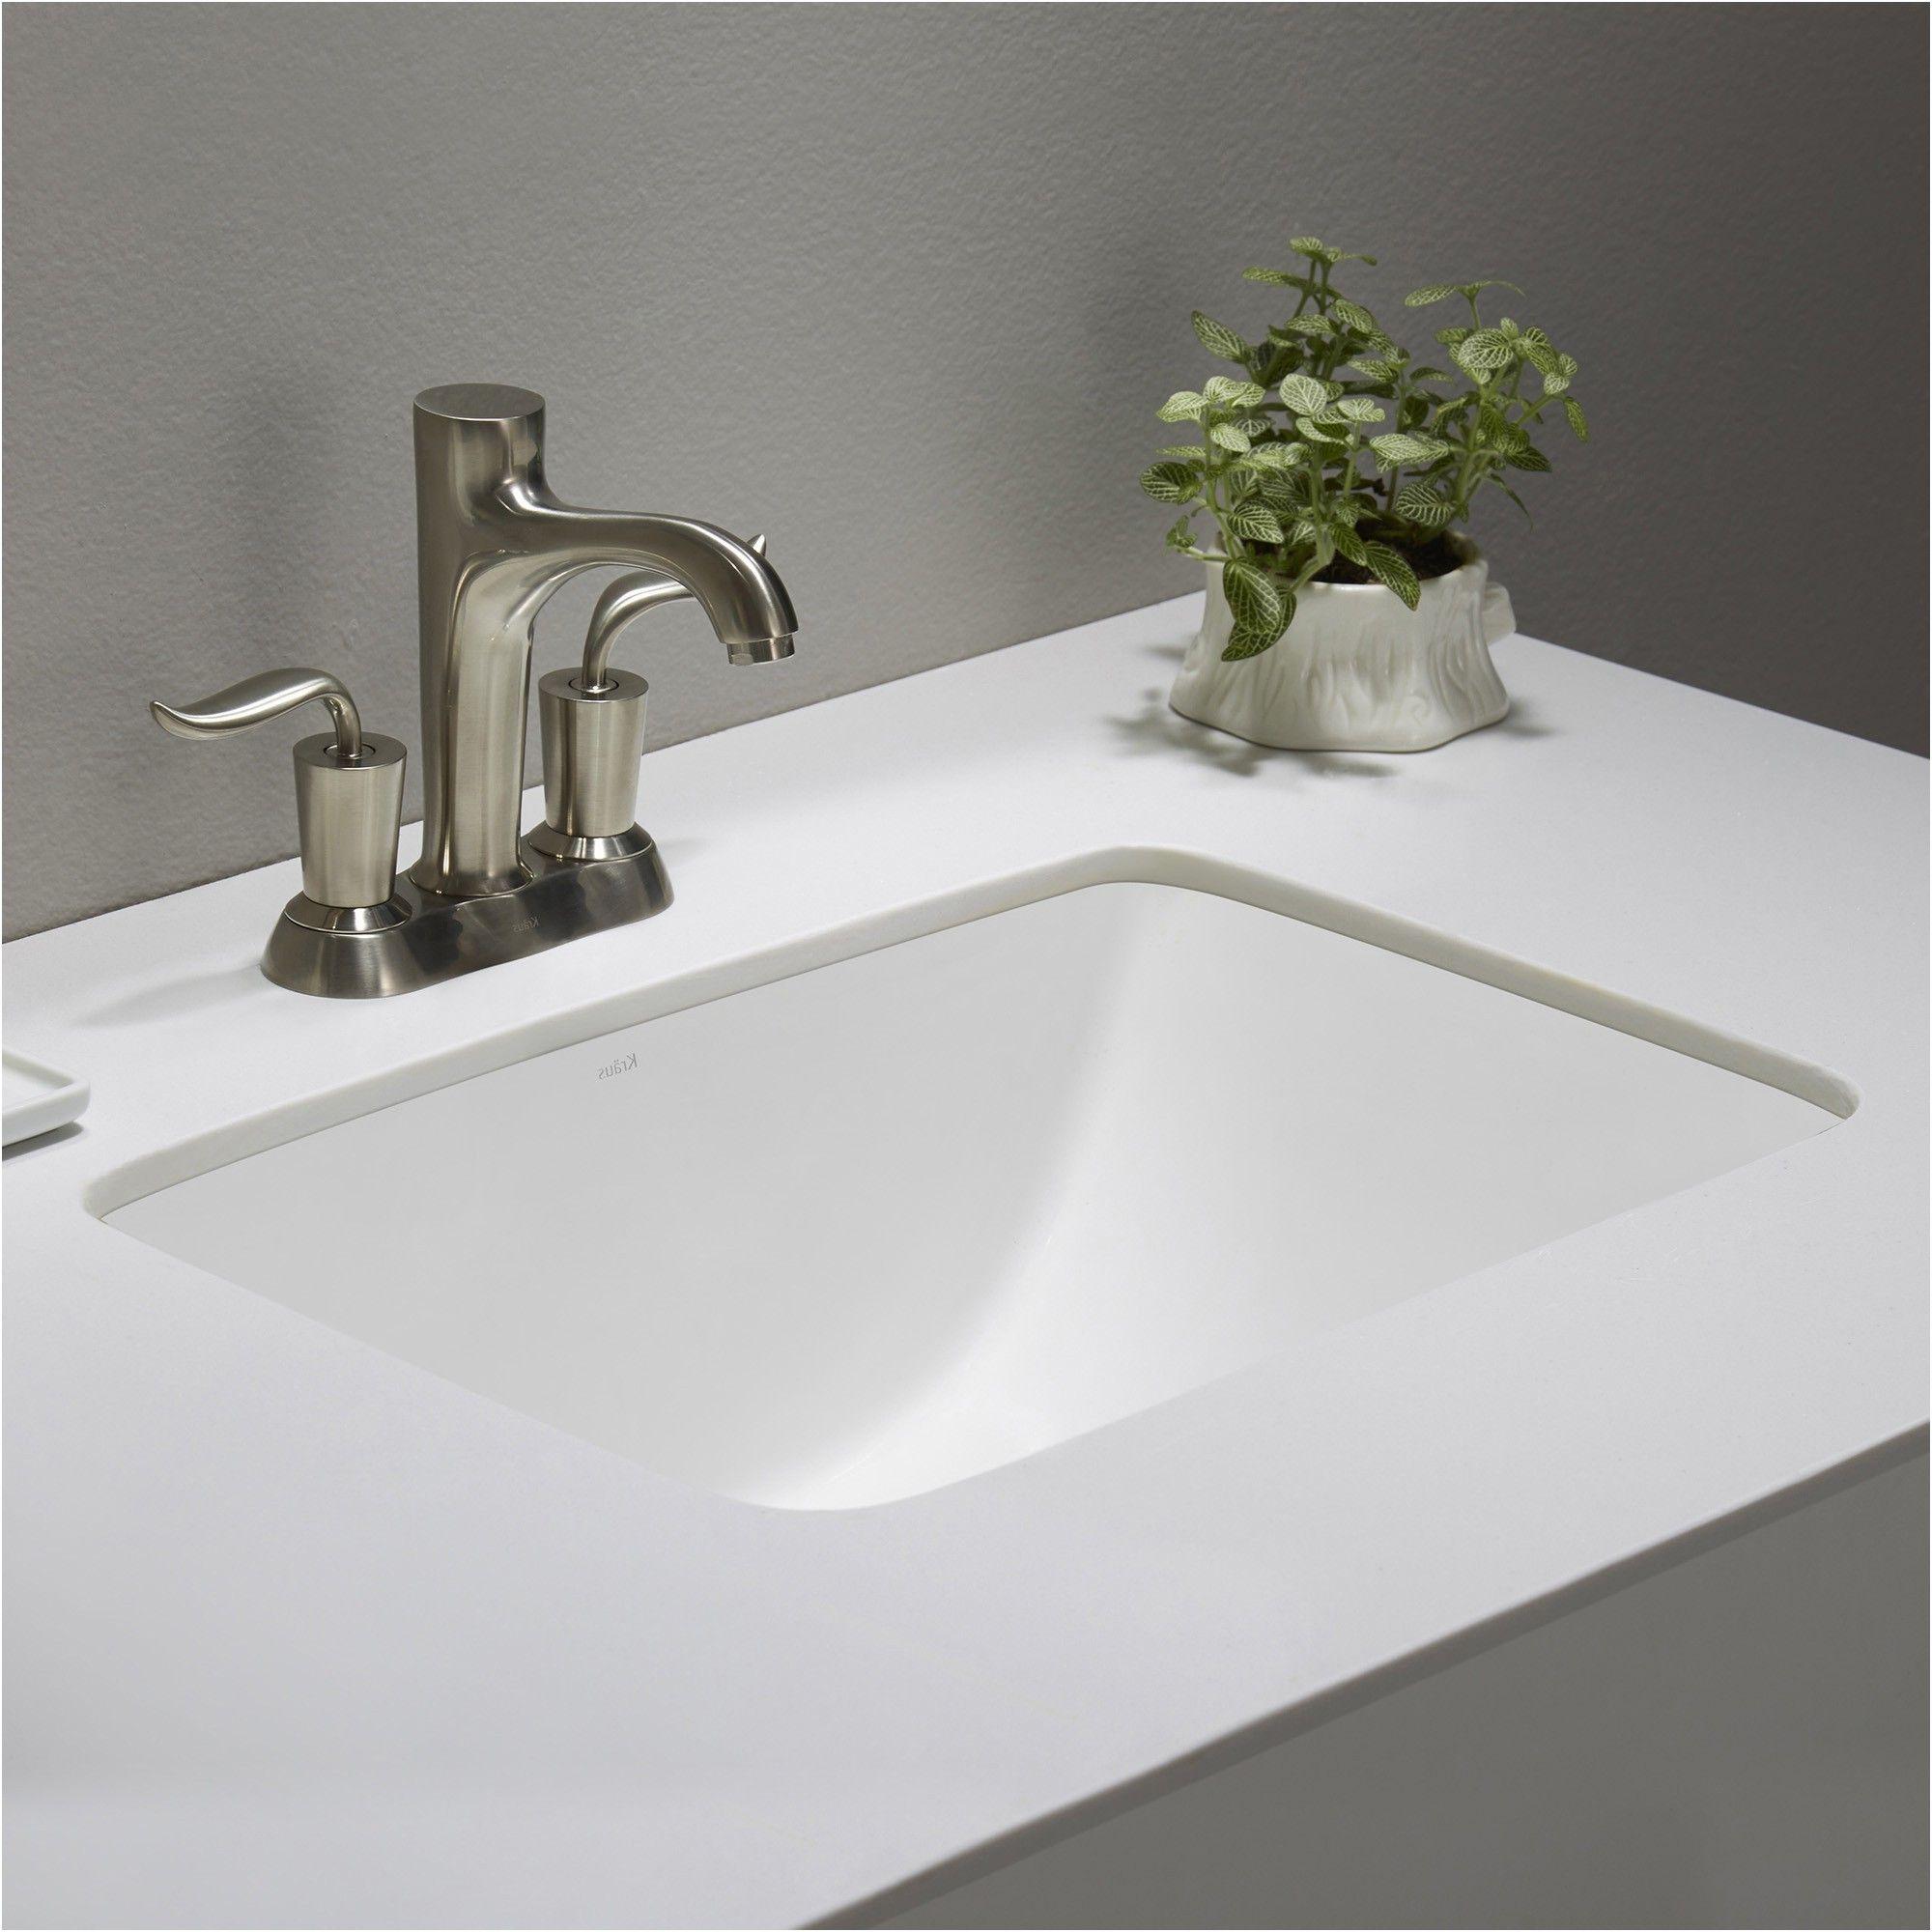 Ceramic Sink Kraususa From Small Undermount Sinks Bathroom